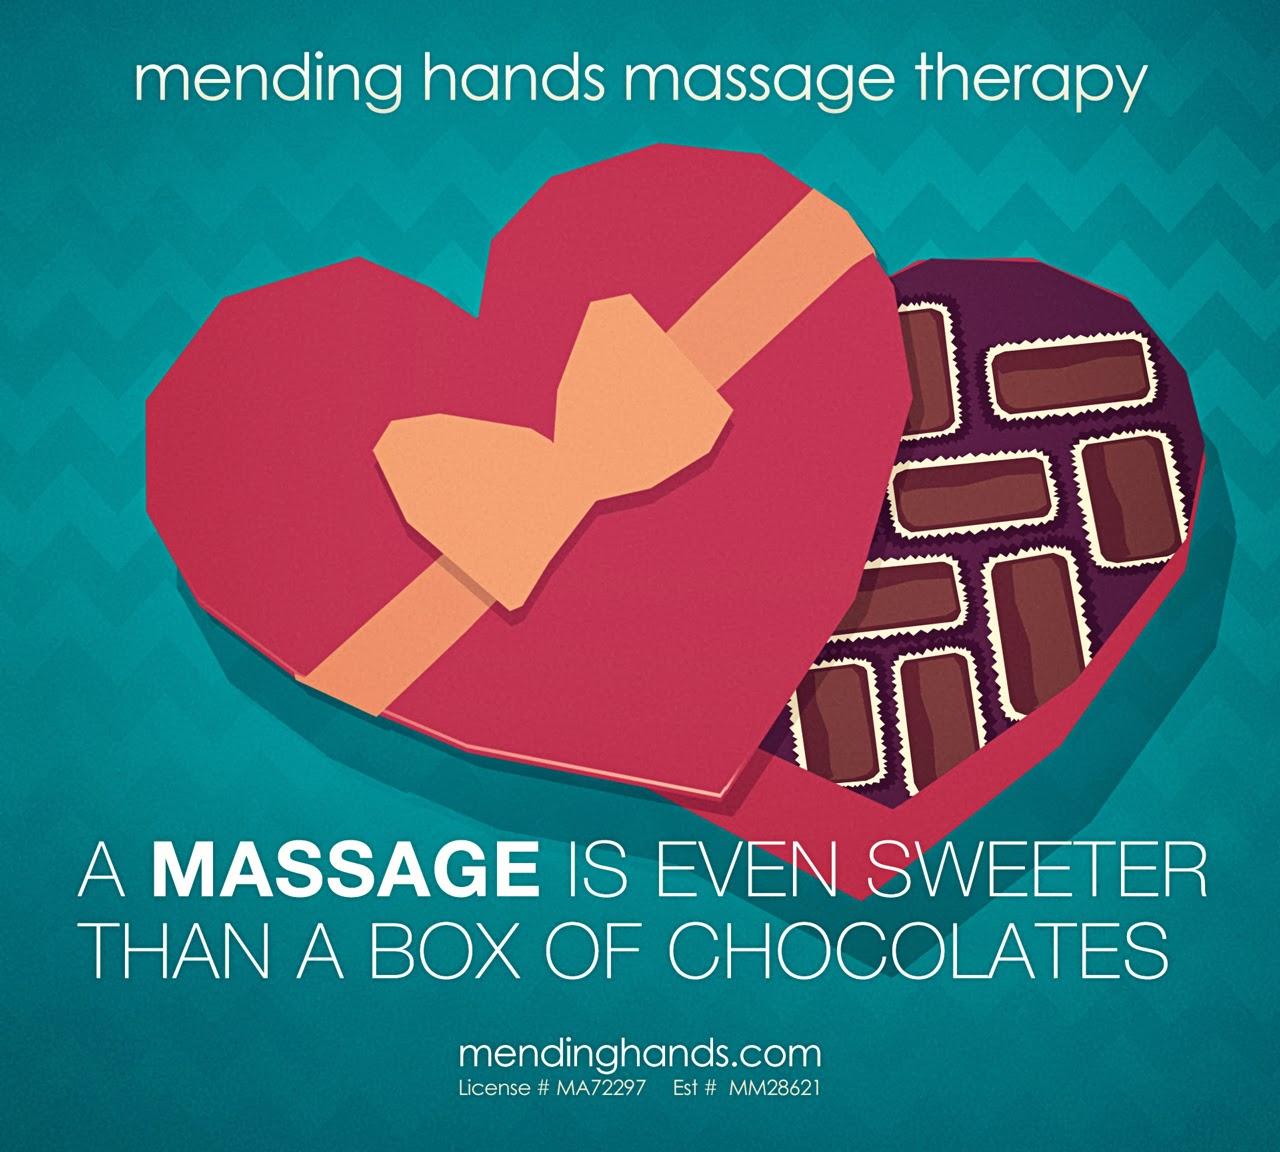 Sarasota massage mending hands melissa finley srq 34239 valentines day gift certificates available xflitez Gallery